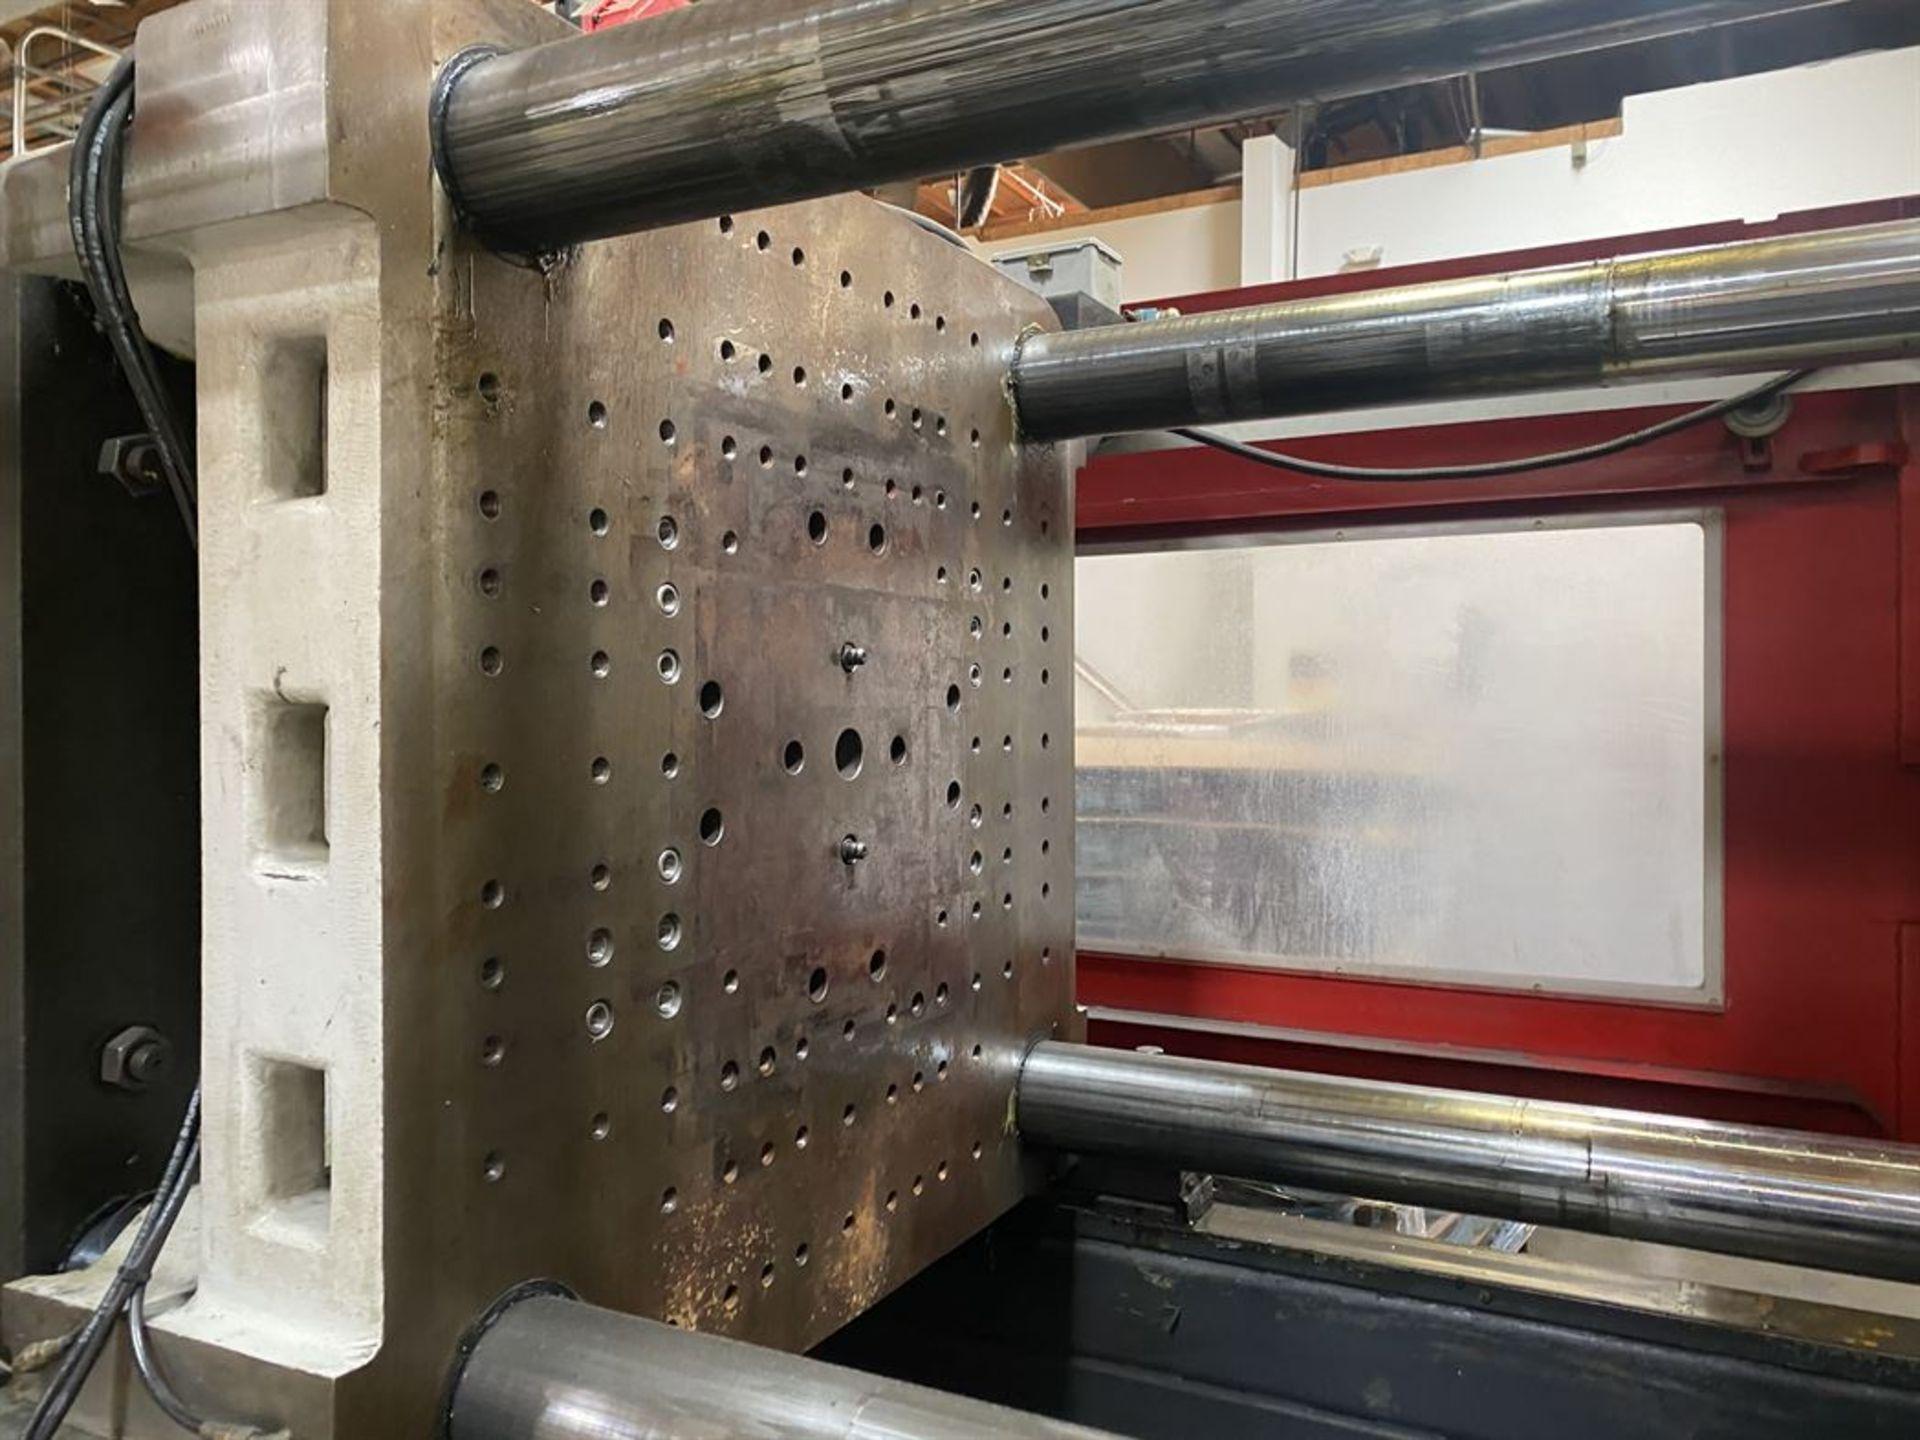 Lot 191 - 2003 CINCINNATI MILACRON POWERLINE NT330 300 Ton Electric Injection Molder, s/n W22A0300072, w/